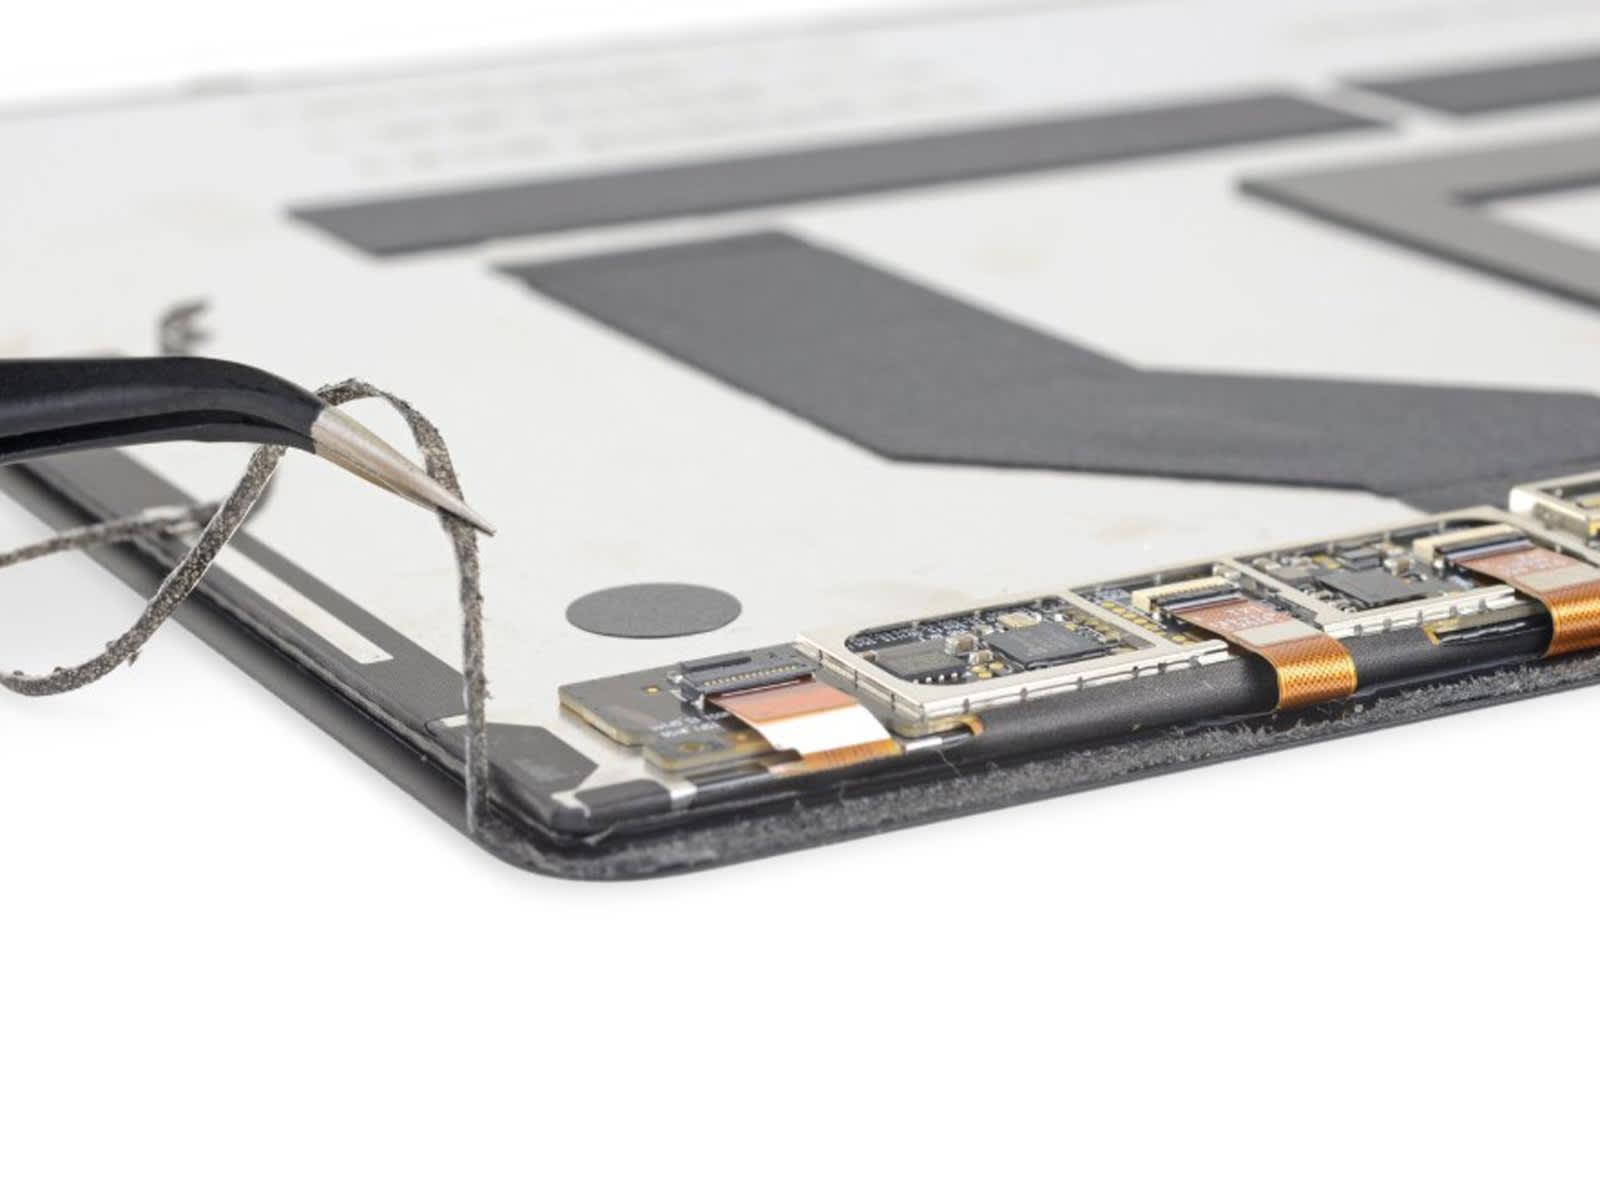 Surface Pro X teardown